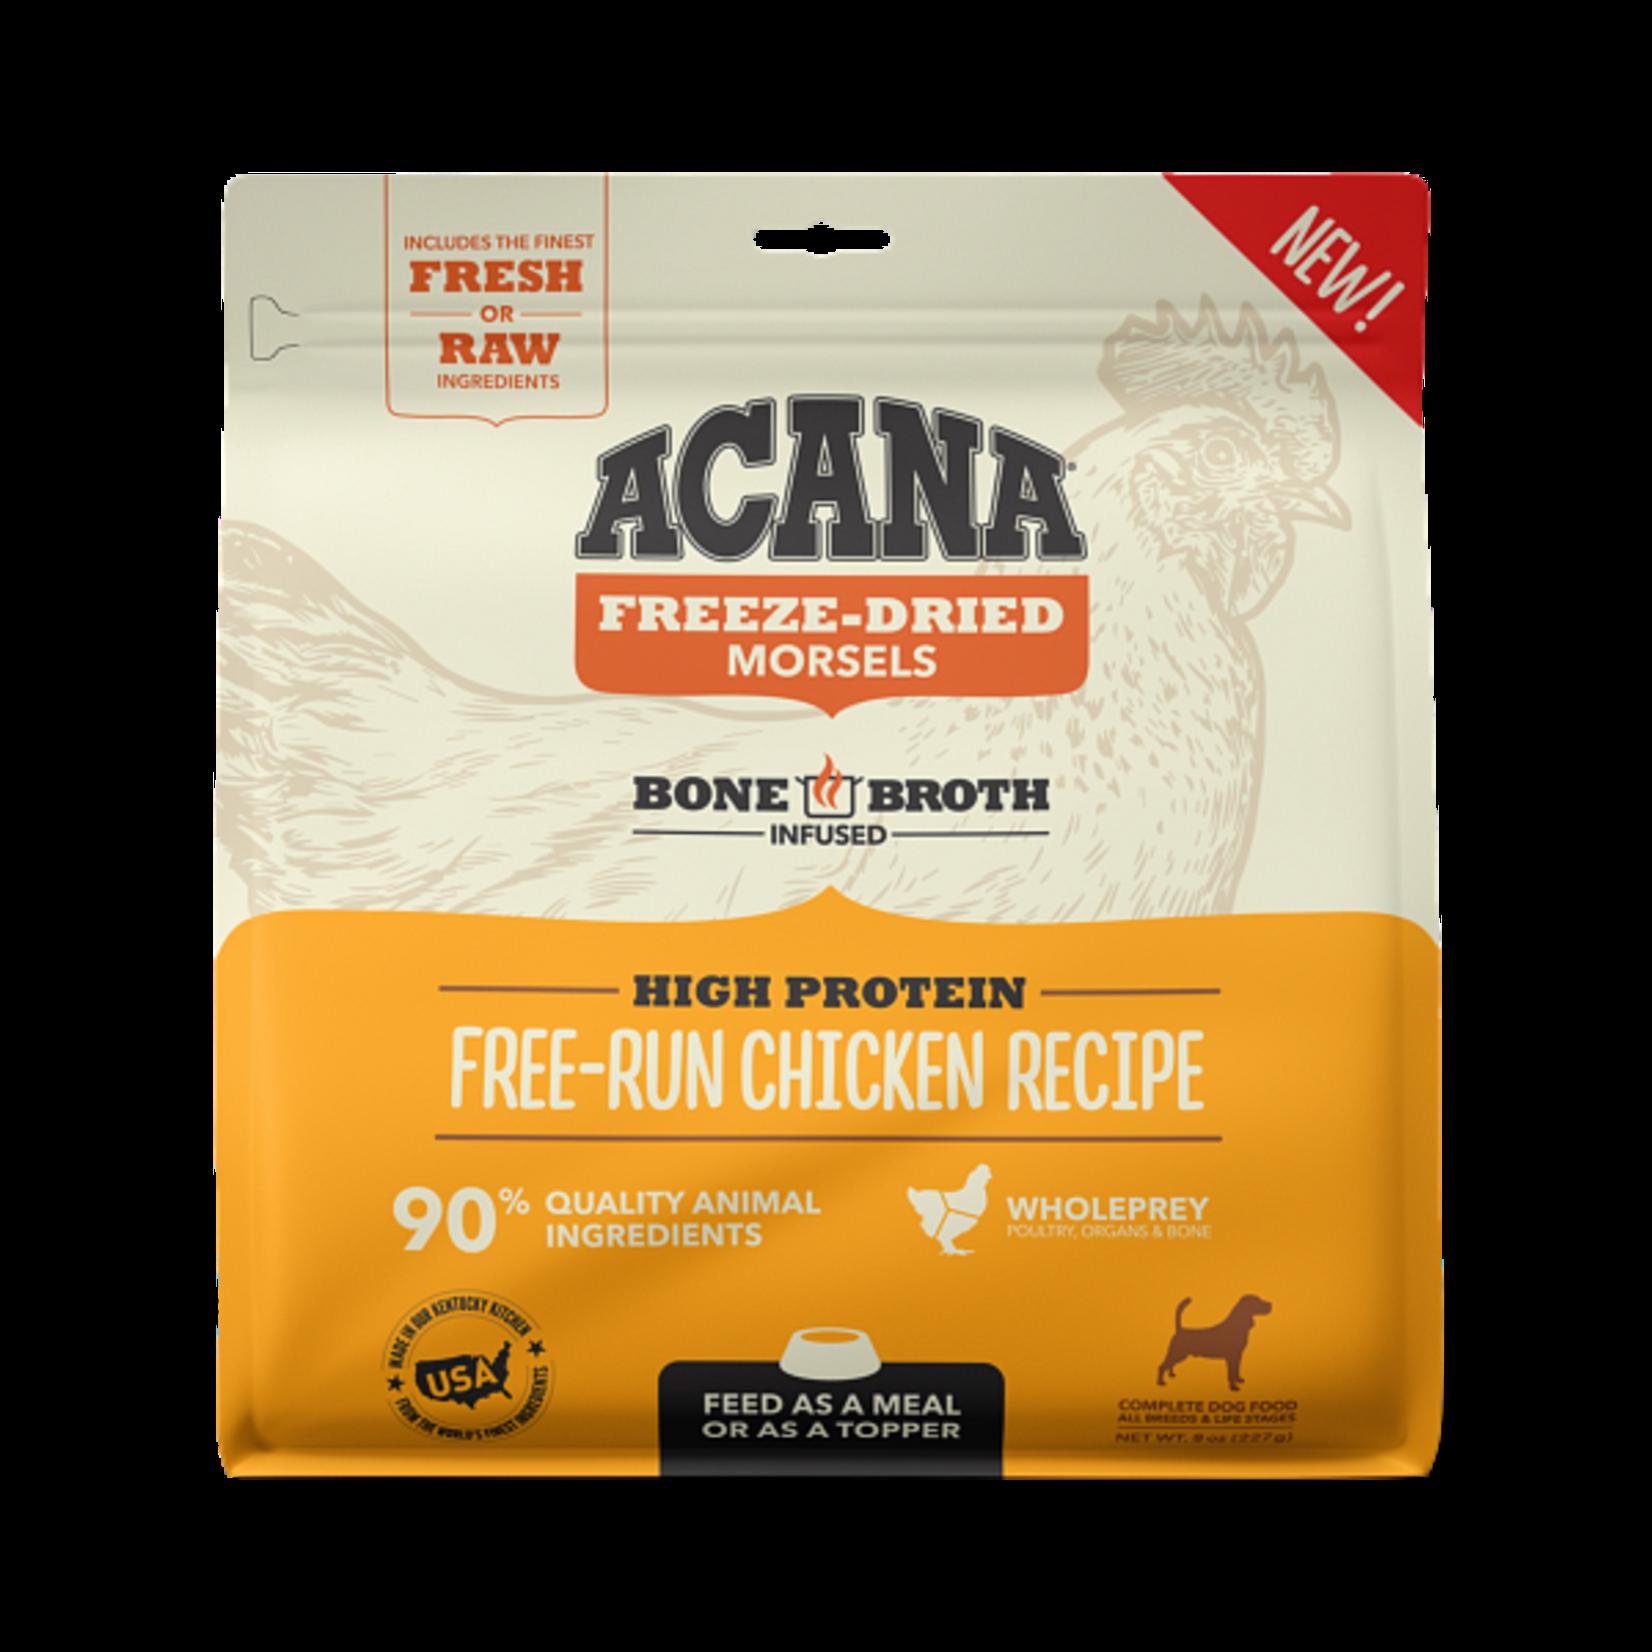 Champion Pet Foods Acana Dog Freeze-dried Free-Run Chicken Morsels 8 OZ